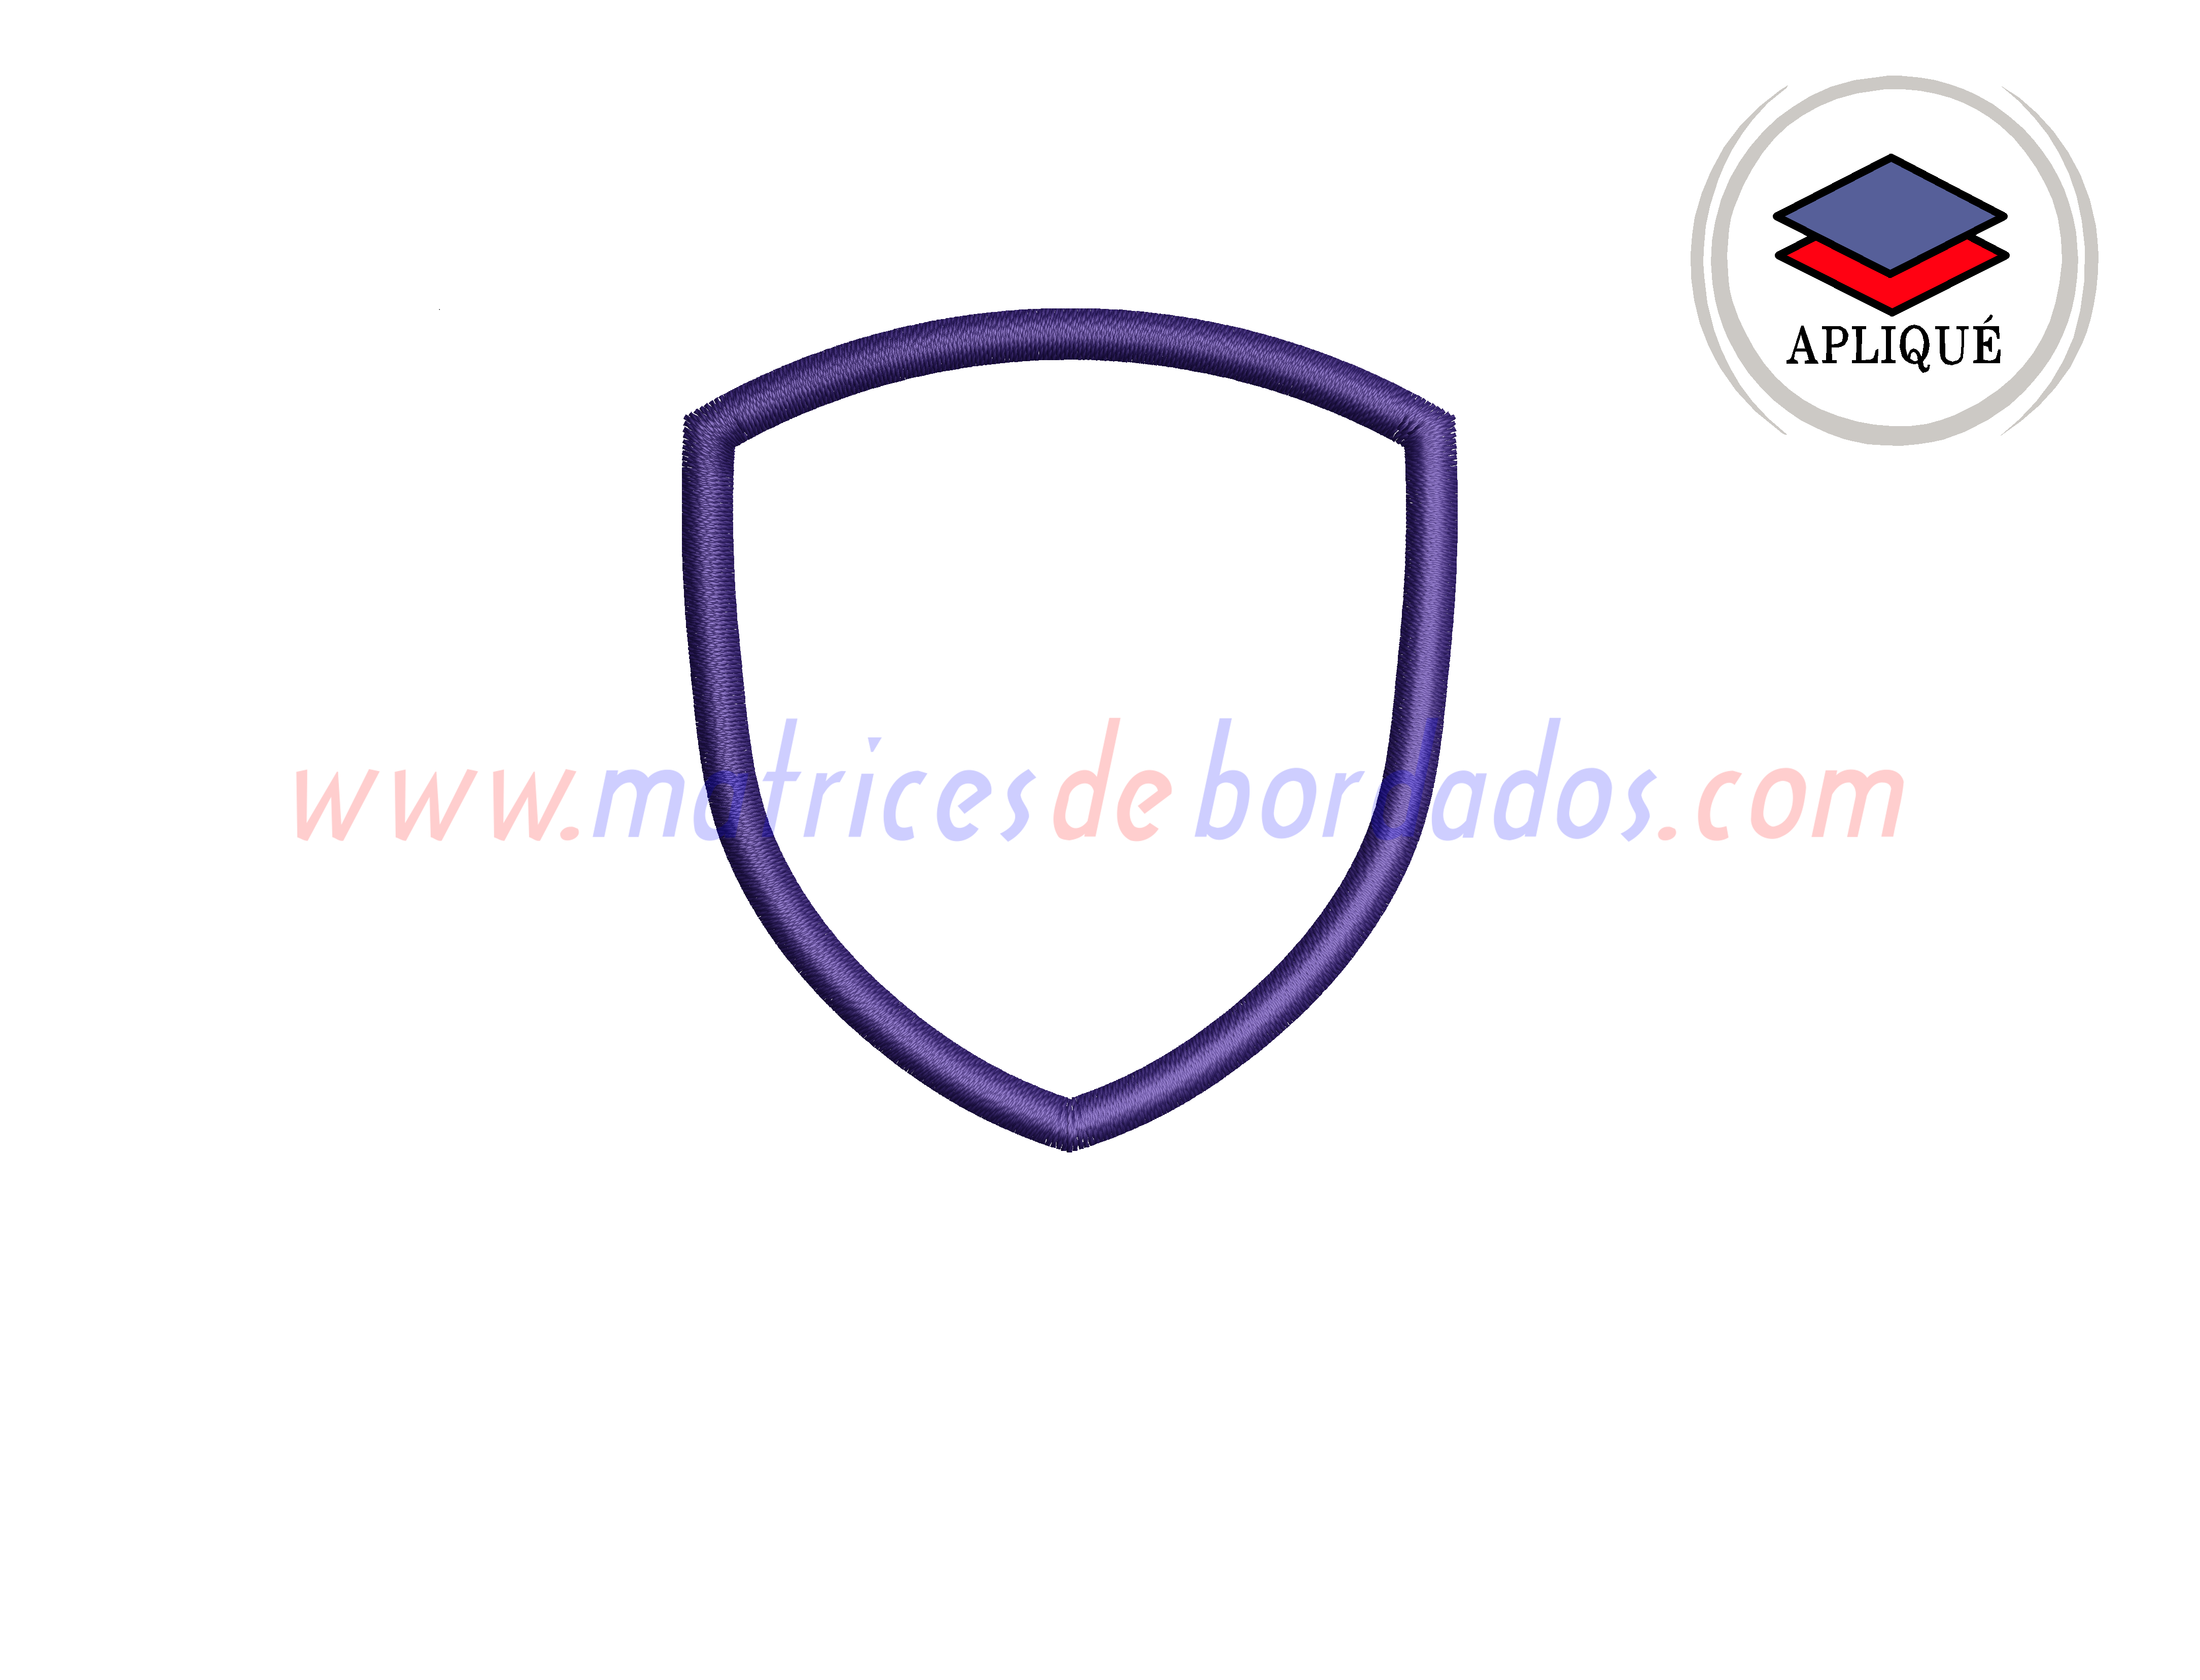 CJ64NR - Parche escudo apliqué